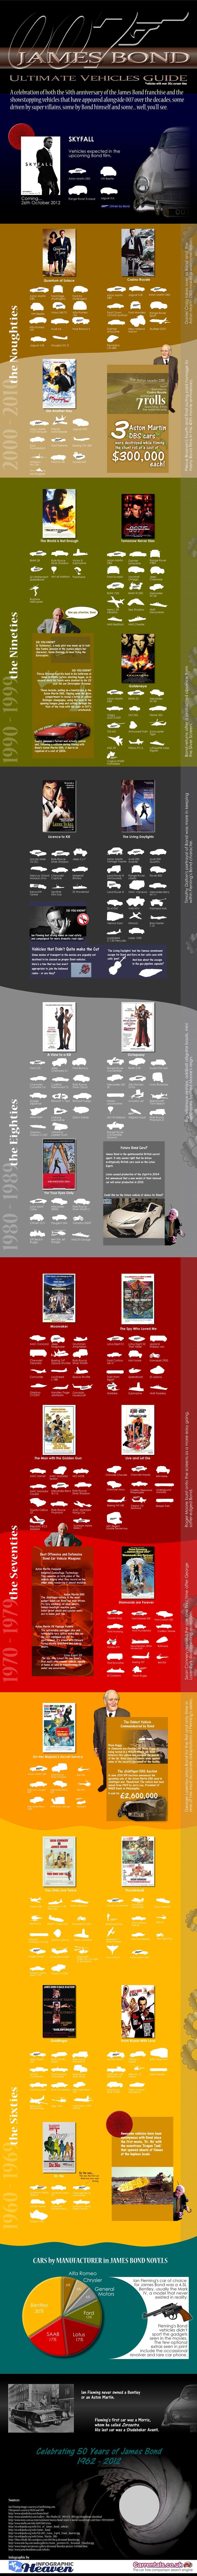 bond-infographic_copy.jpg